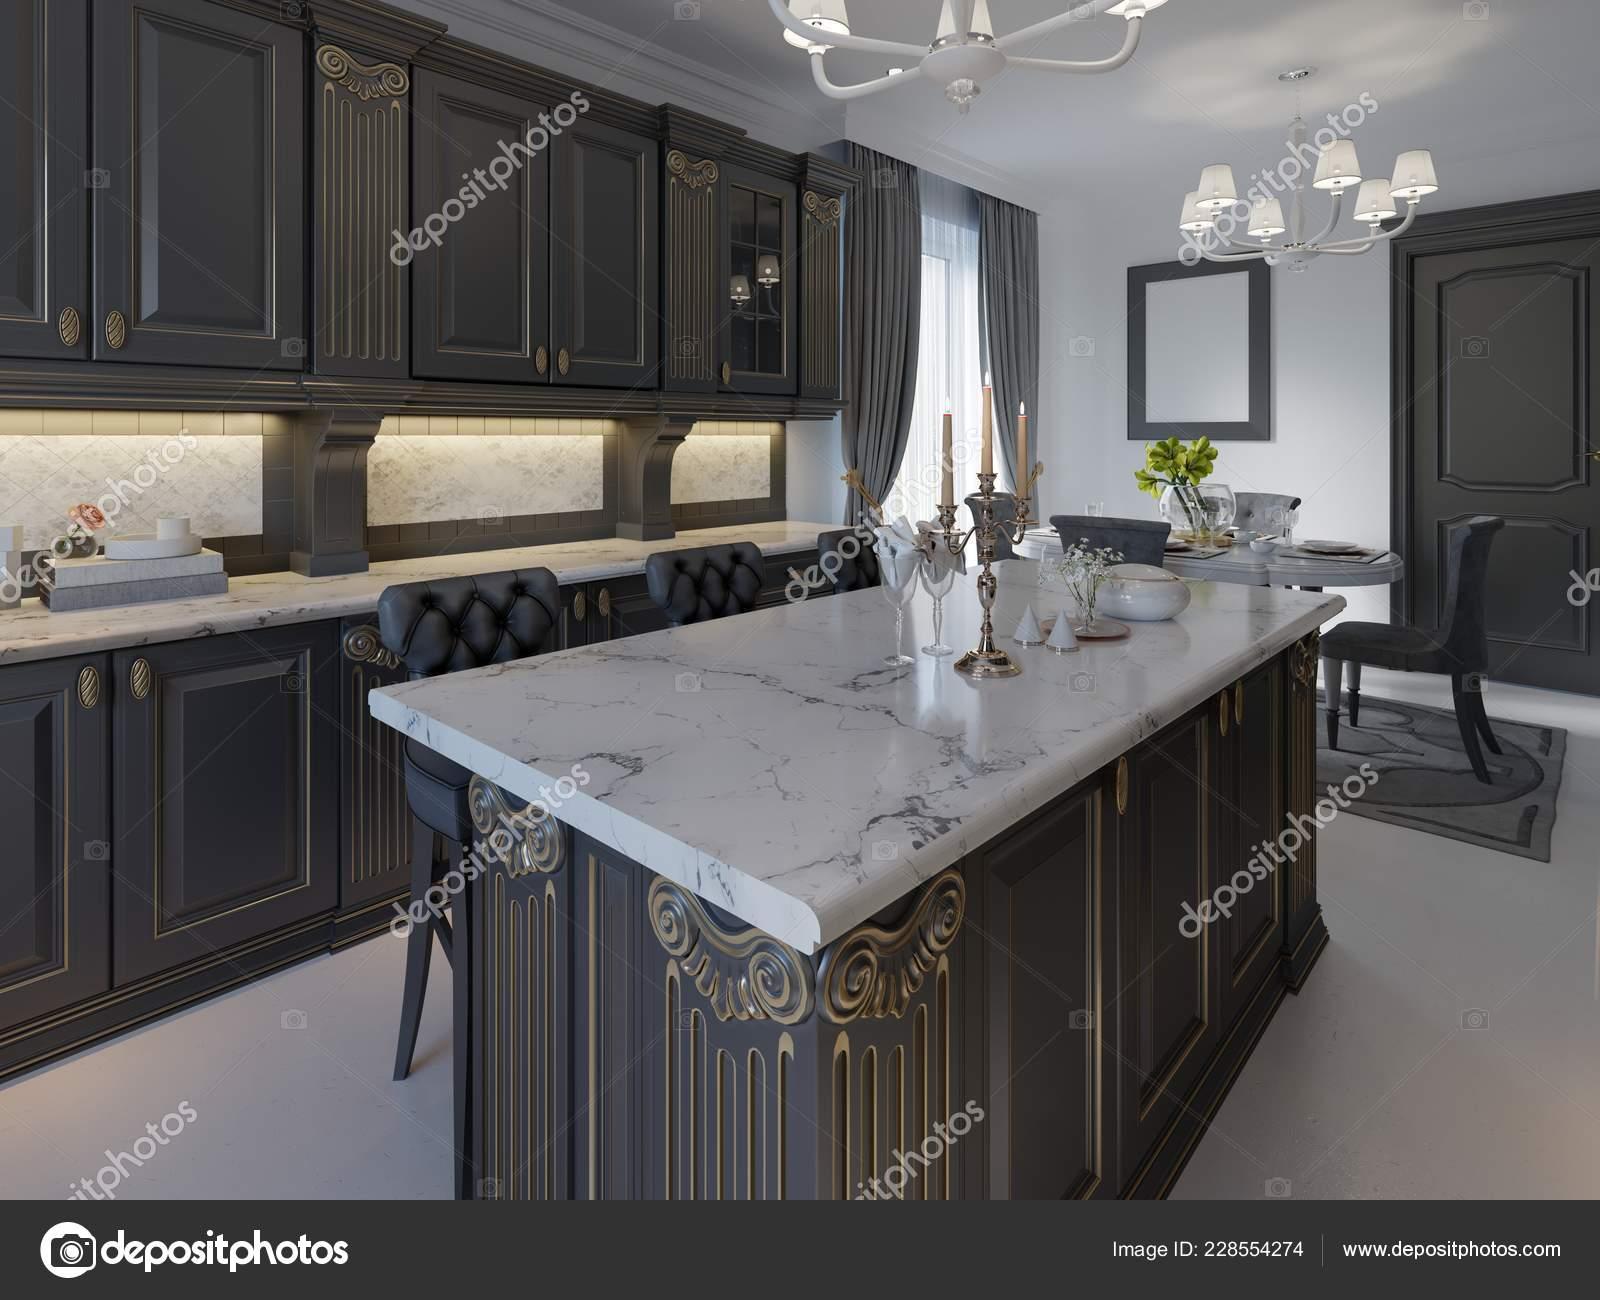 Black Bar Stools Kitchen Island Bright Living Room Rendering Stock Photo C Kuprin33 228554274